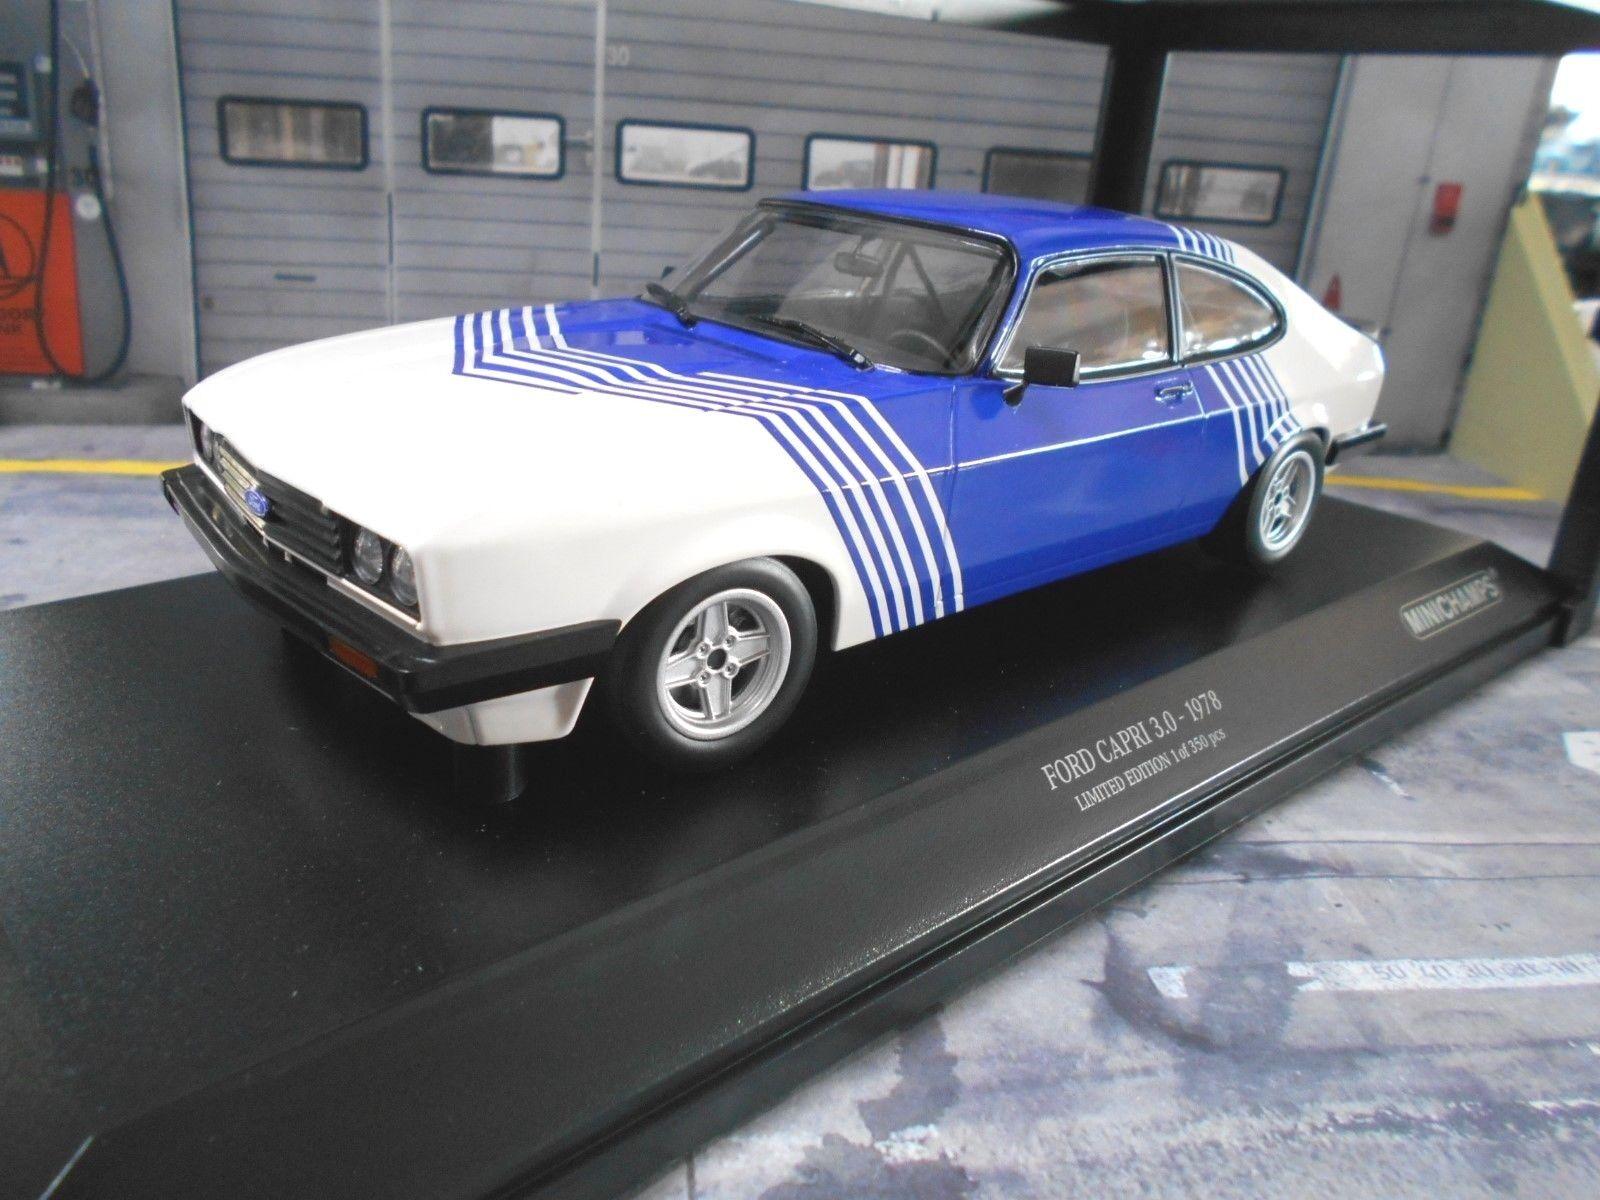 Ford Capri 3 III 3.0 S Sport Coupé Blanc Bleu 1978 Minichamps 1 18